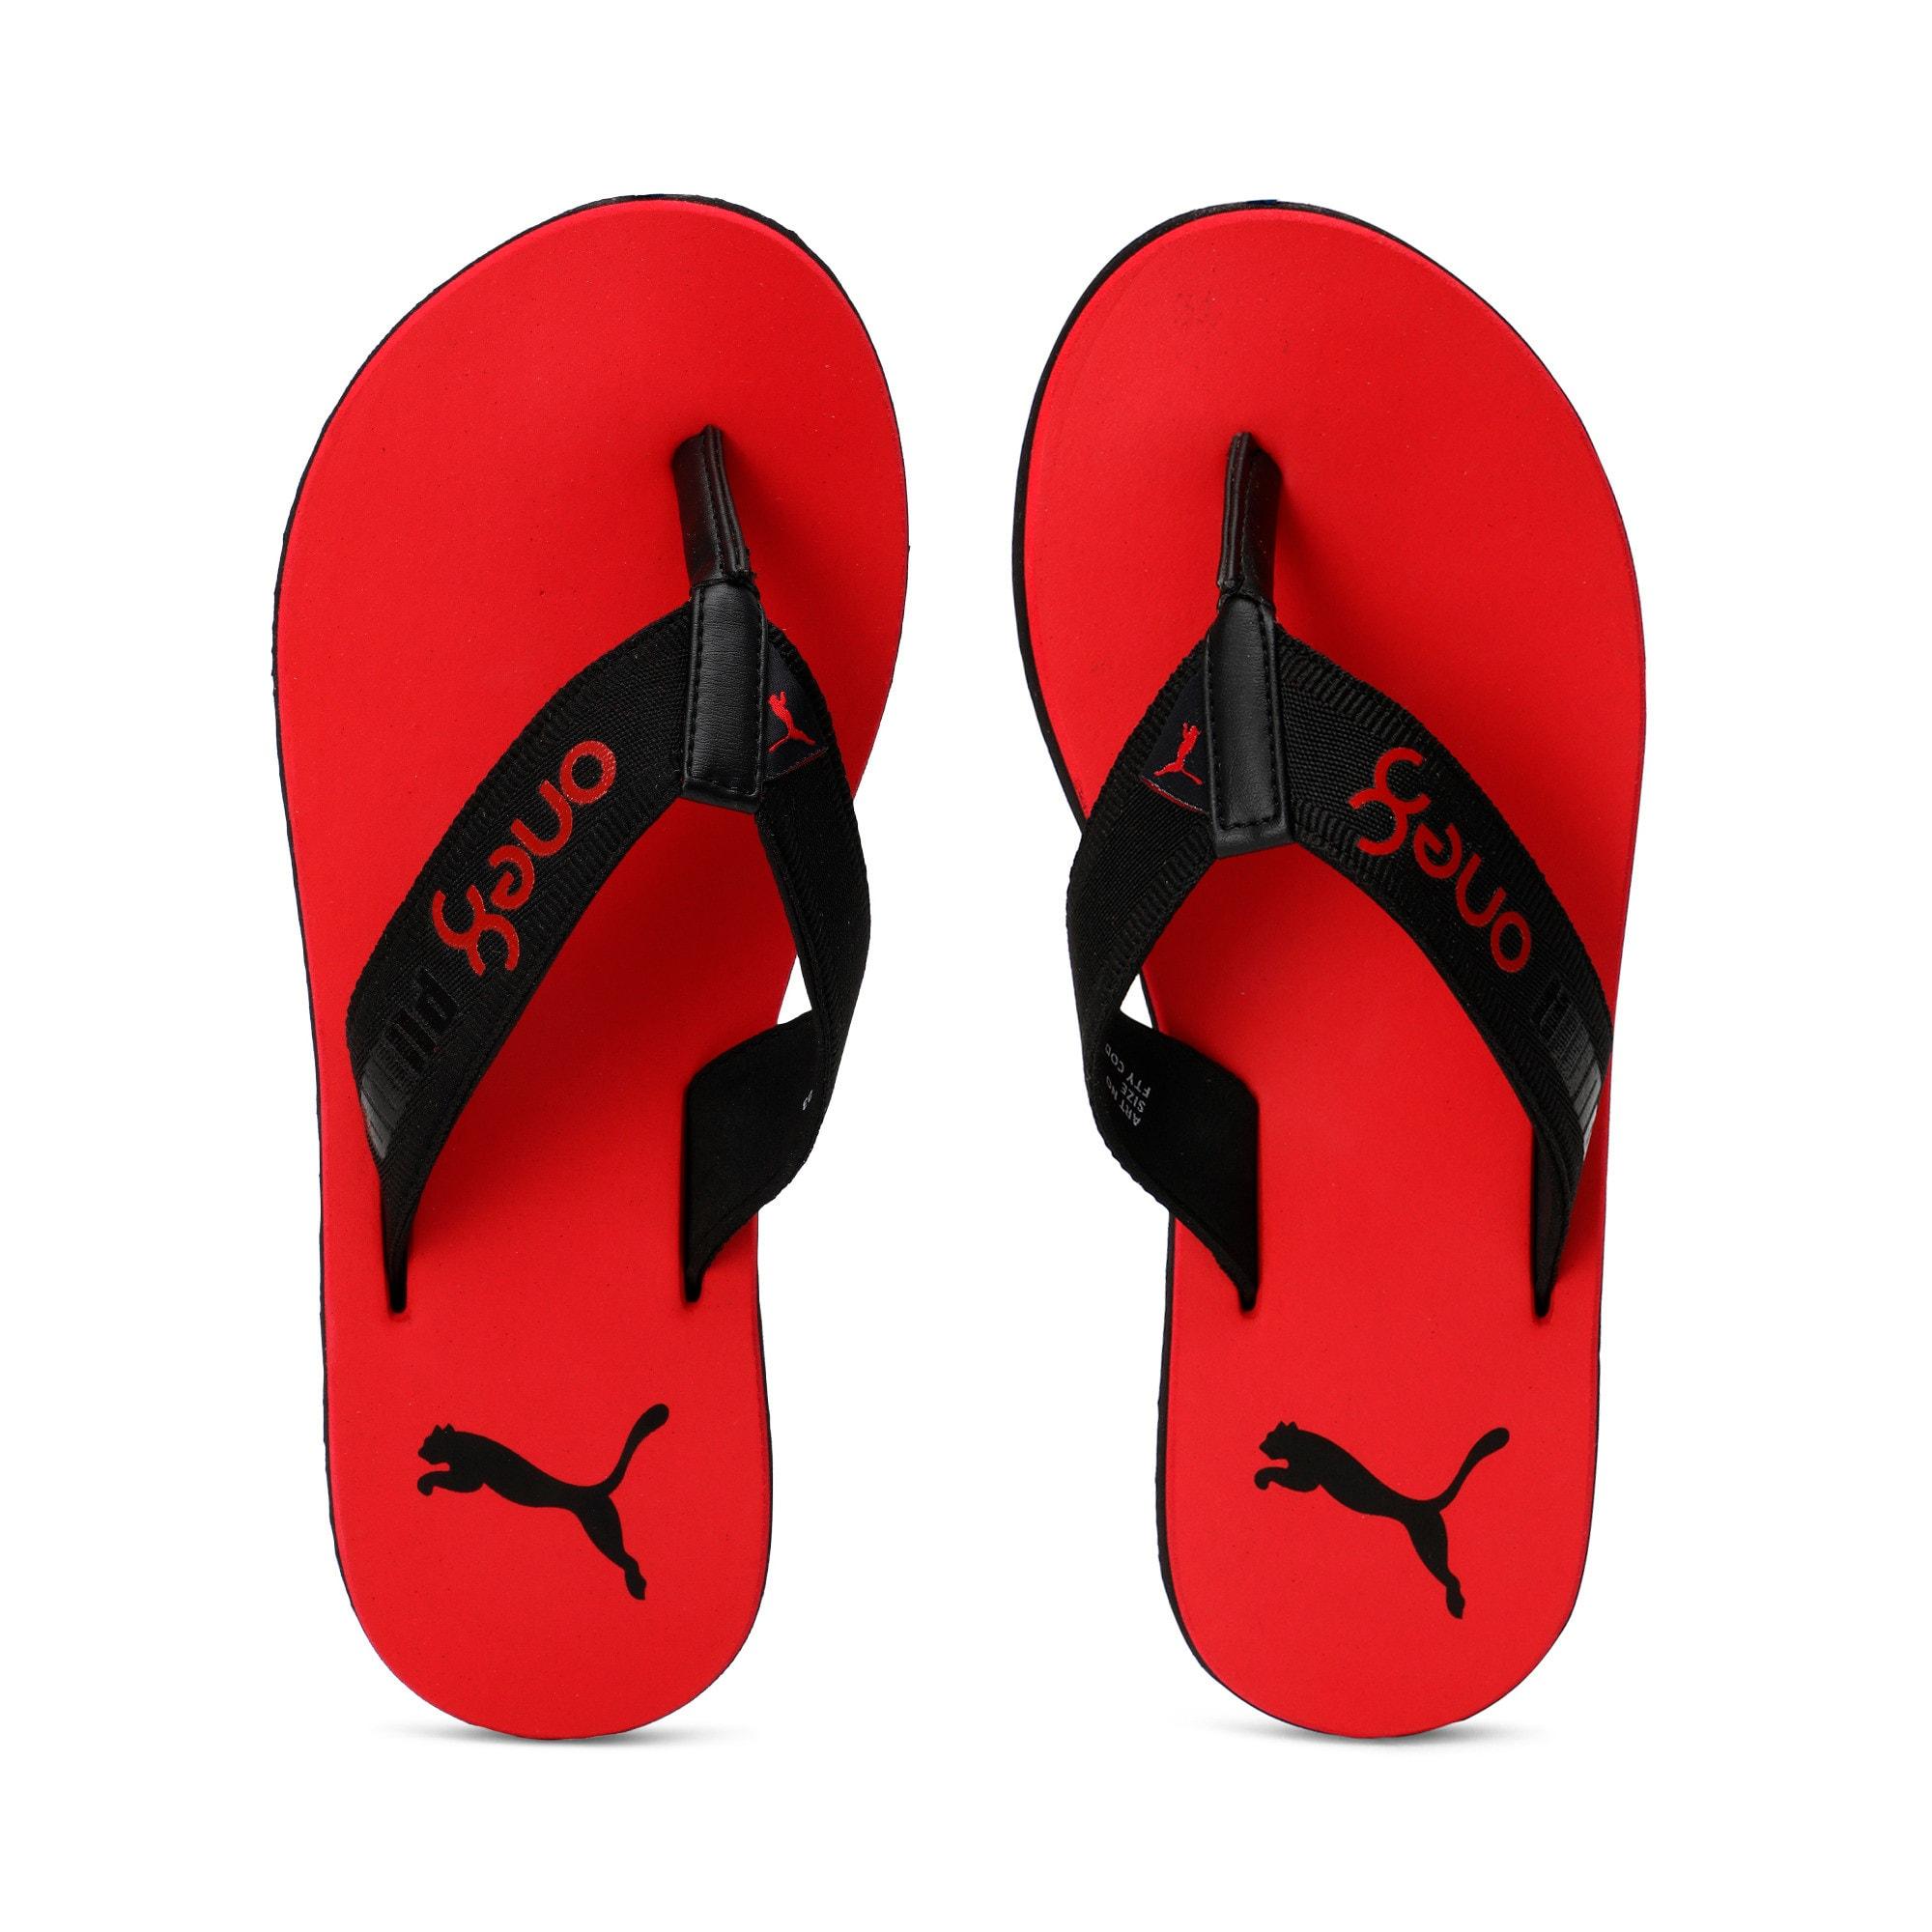 Thumbnail 6 of Breeze one8 GU Men's Sandals, High Risk Red-Puma Black, medium-IND